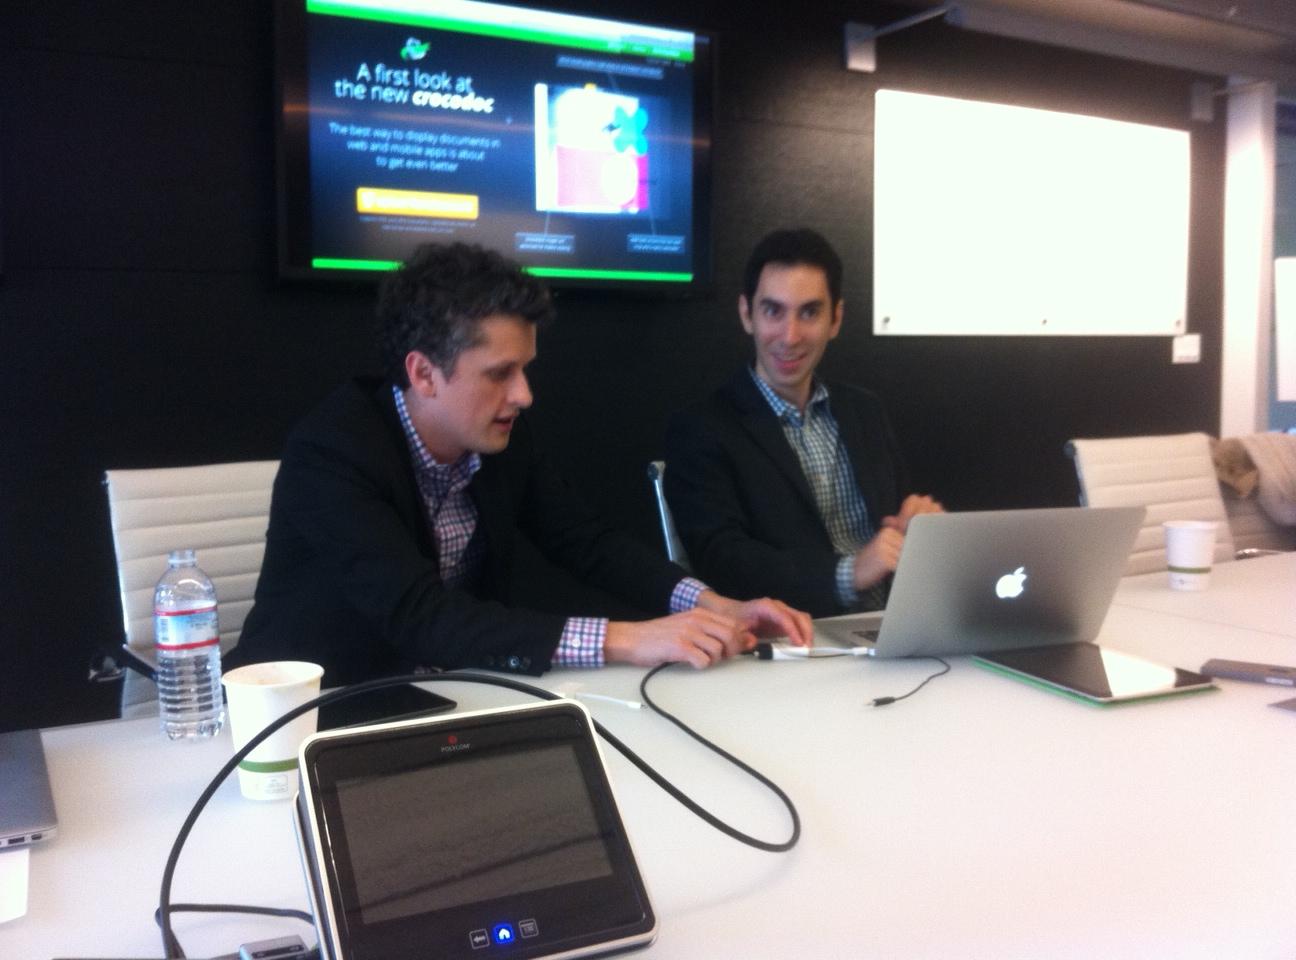 Box CEO Aaron Levie, left, and Crocodoc CEO Ryan Damico at Box